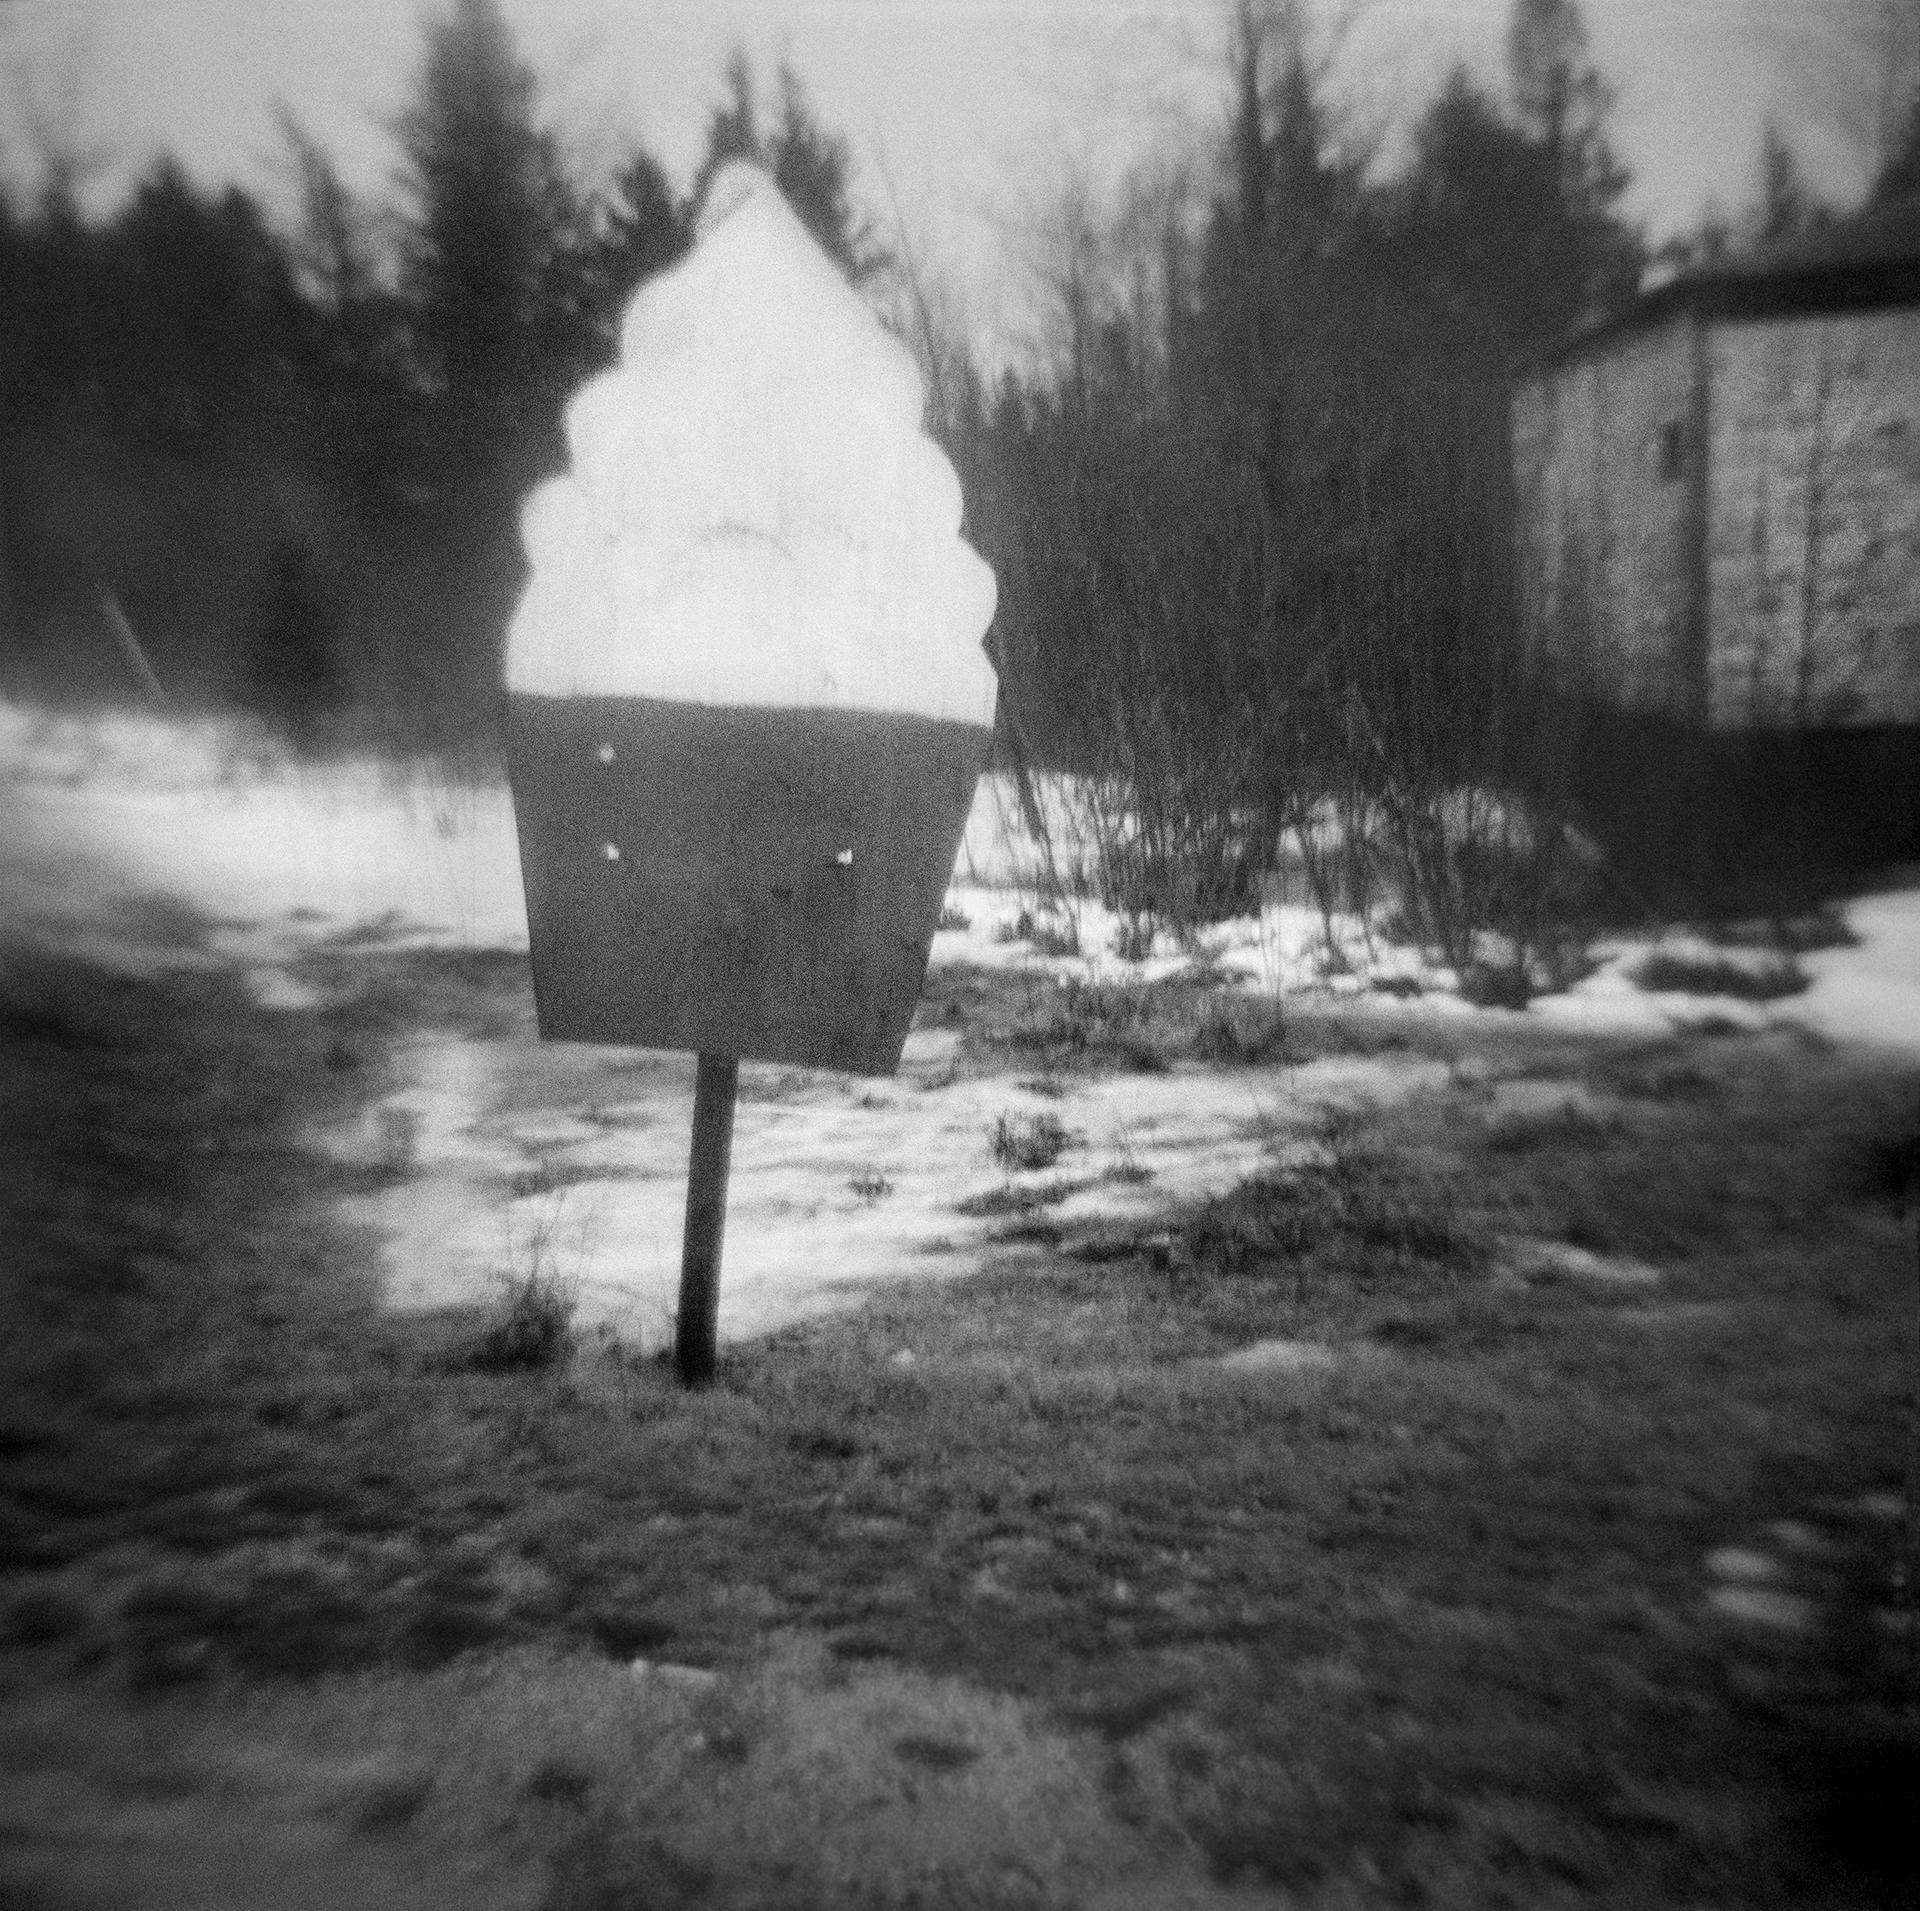 Untitled (ice cream sign), 2013